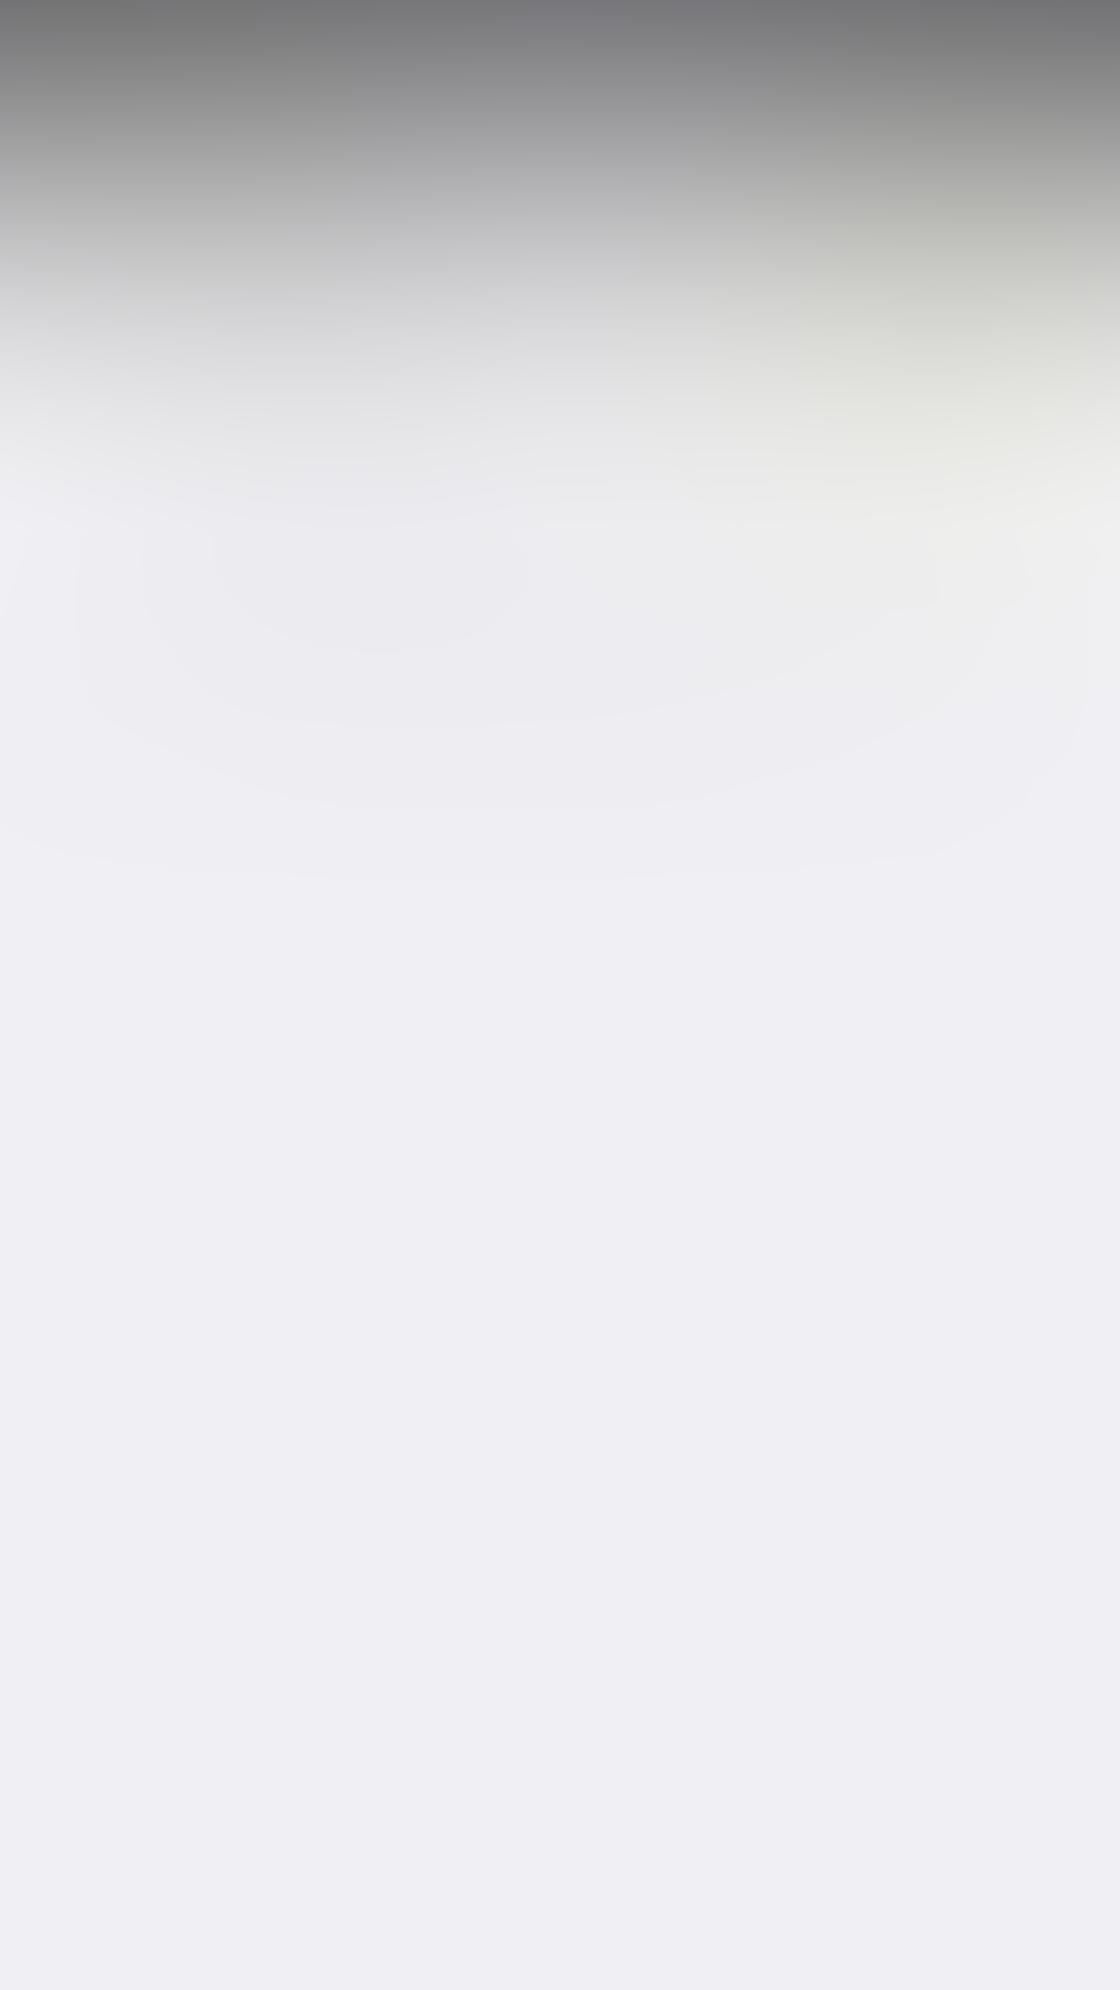 iPhone Shutter Release 4